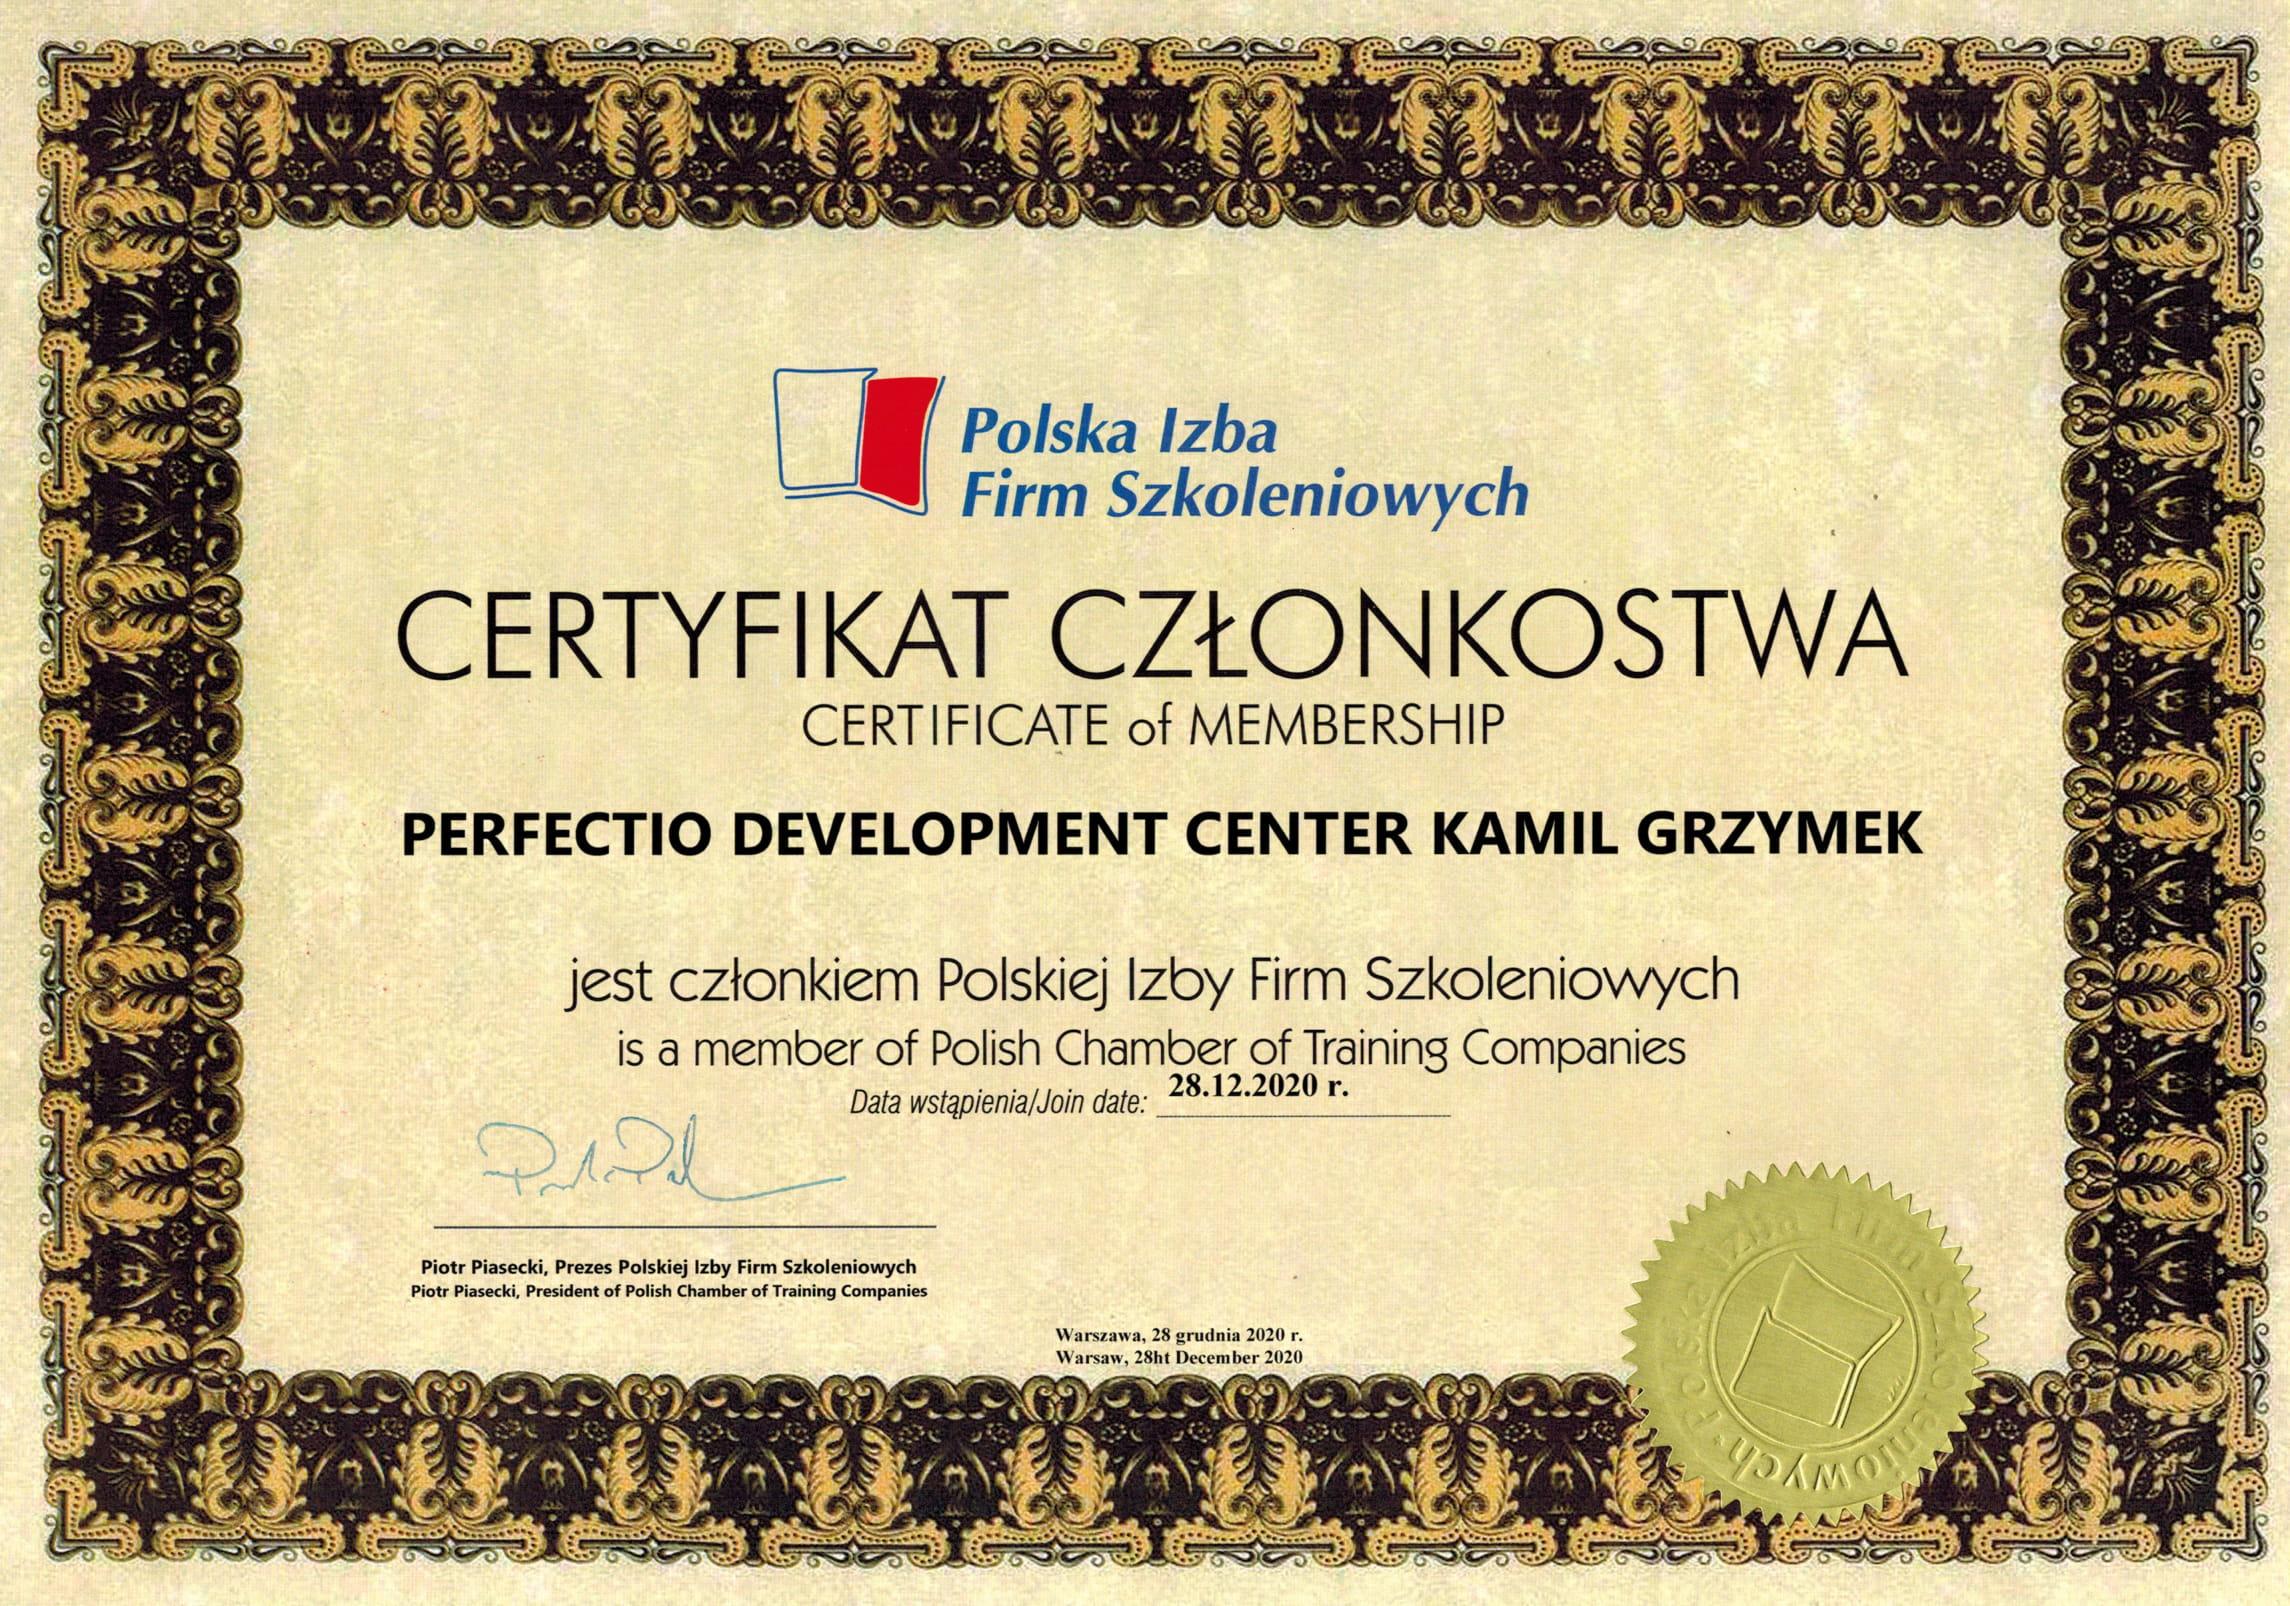 Perfectio Development Center PIFS